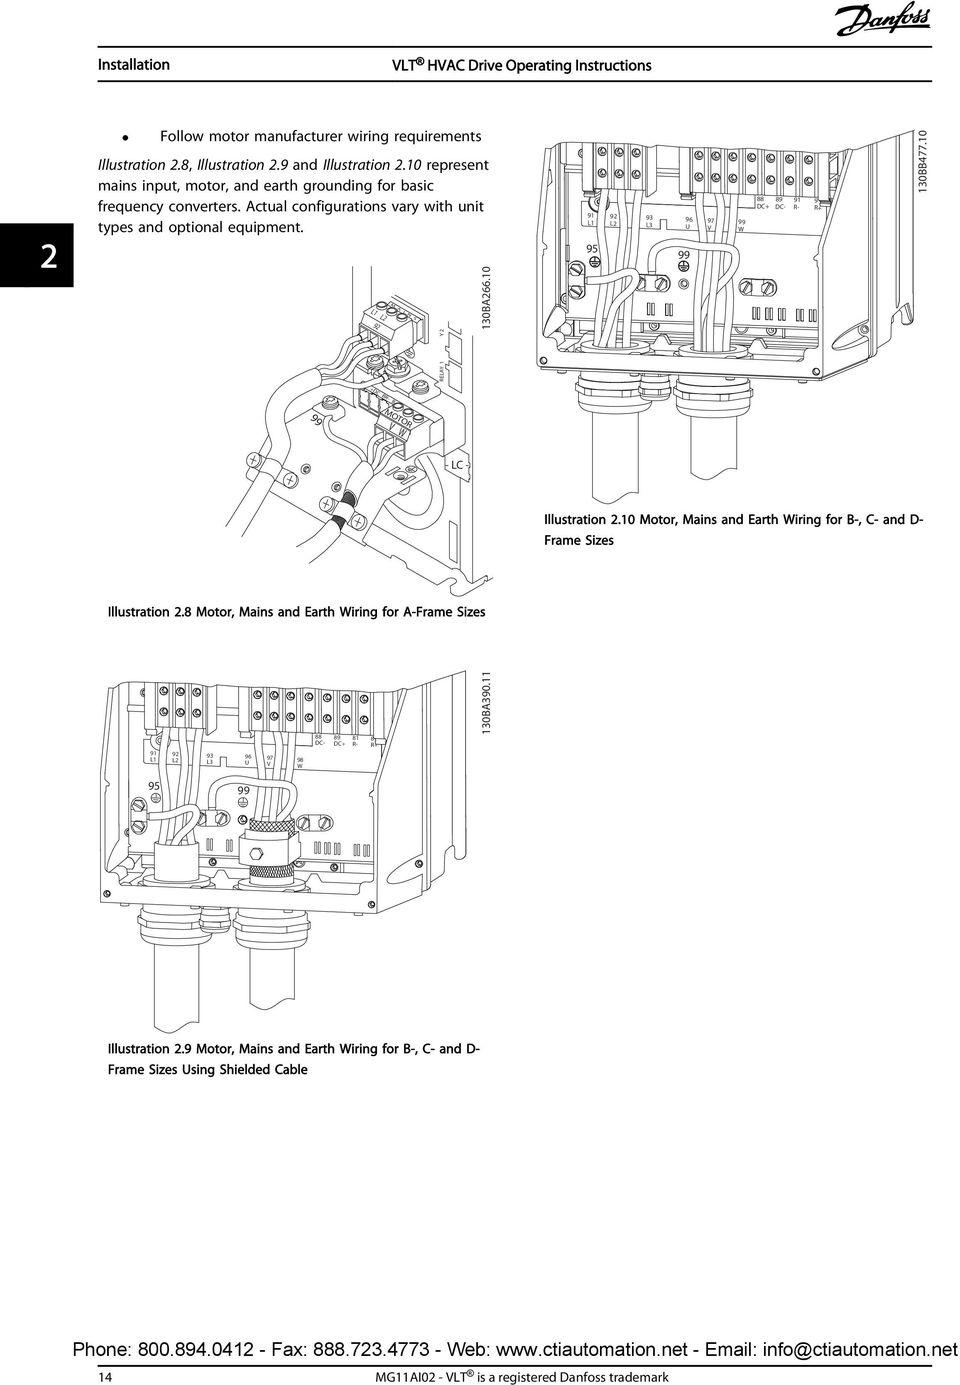 hight resolution of danfoss vlt hvac wiring diagram operating instructions vlt hvac drive fc 102 kw